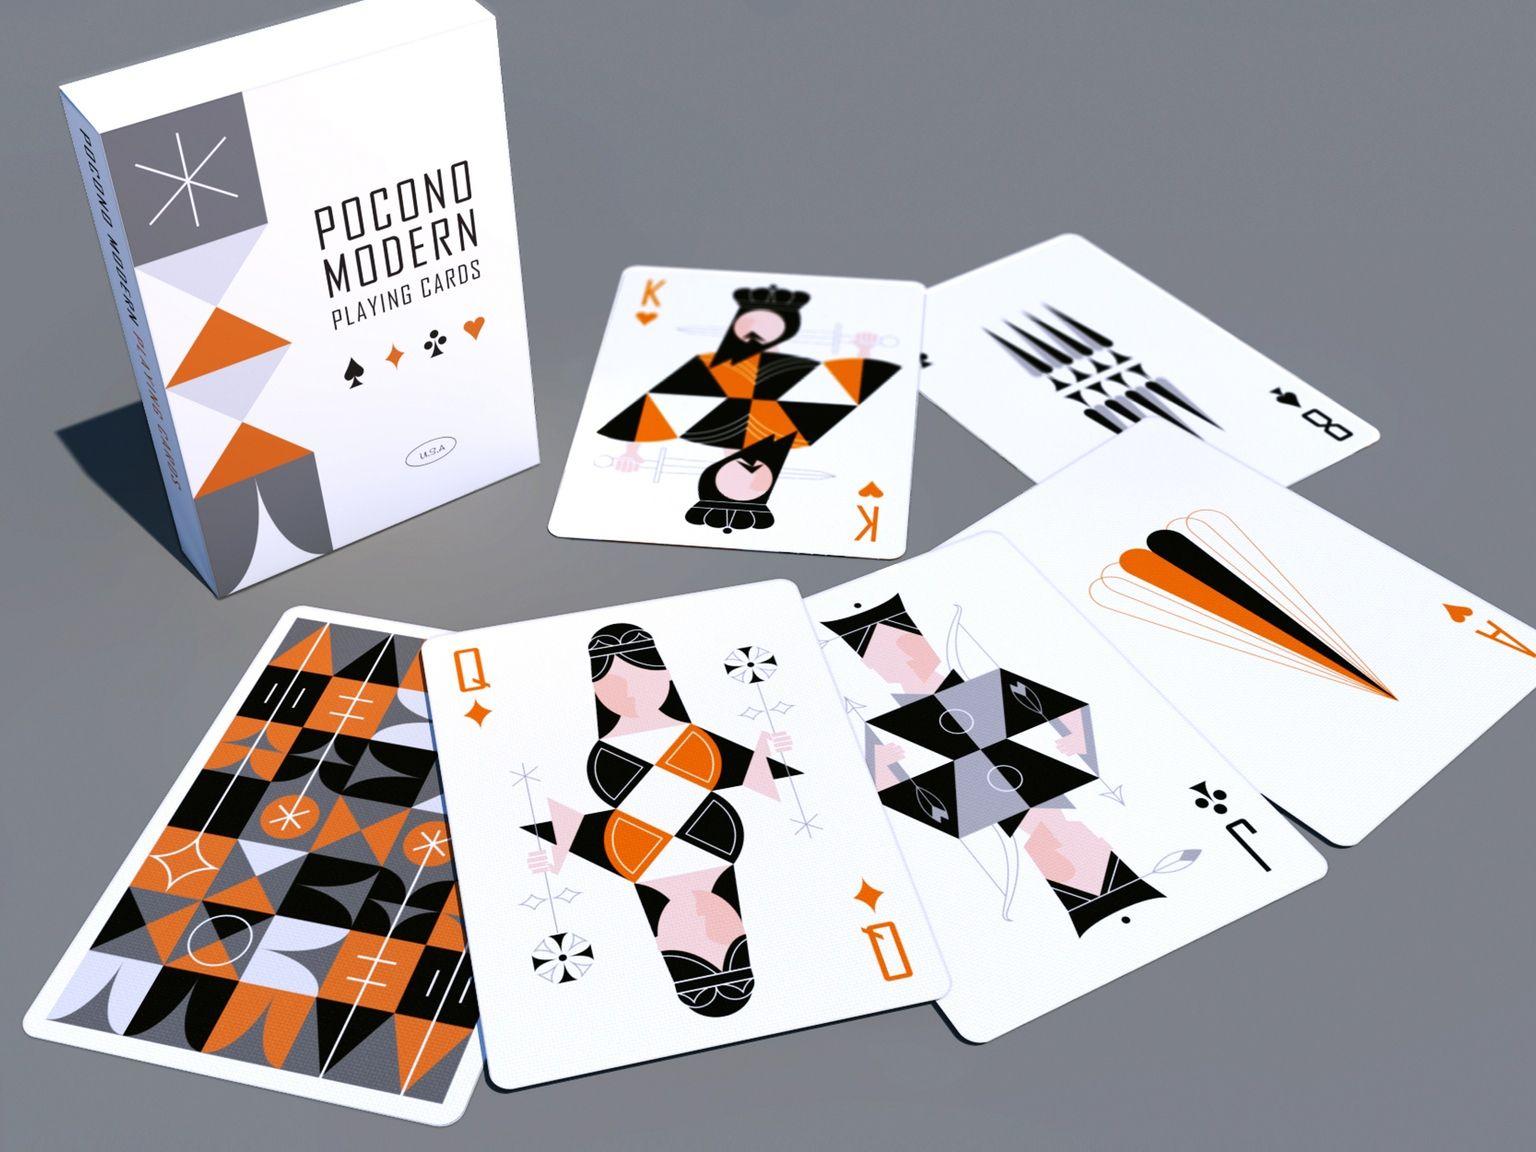 The Retro Deck Playing Cards By Pocono Modern By Kraig Kalashian